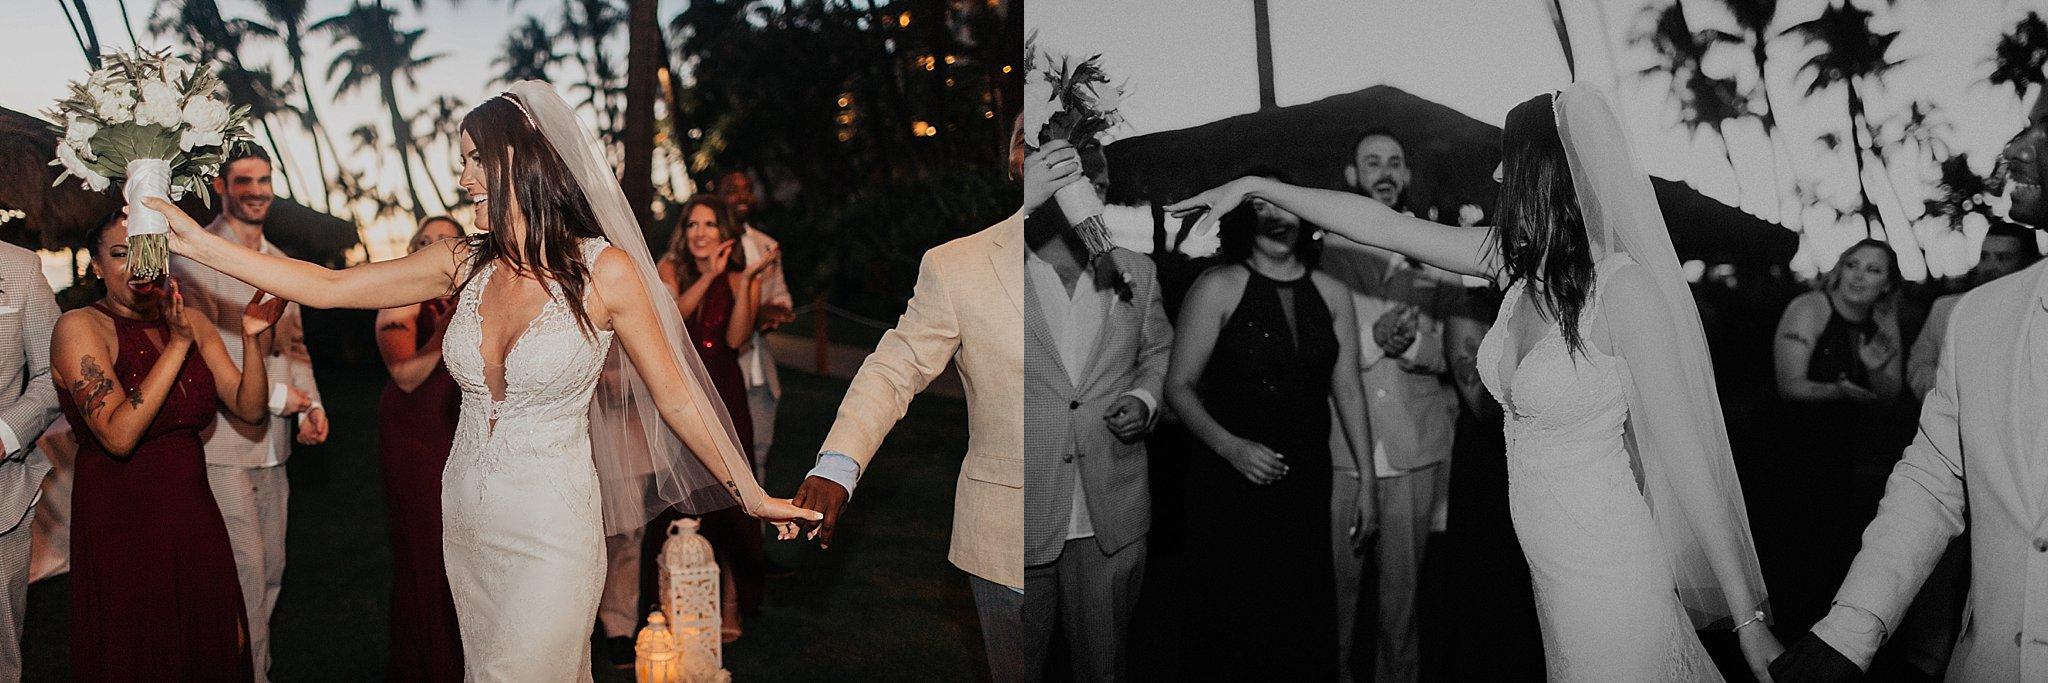 samantha_mcfarlen_bellingham_washington_engagement_photography_seattle_wedding_photographer_0246.jpg